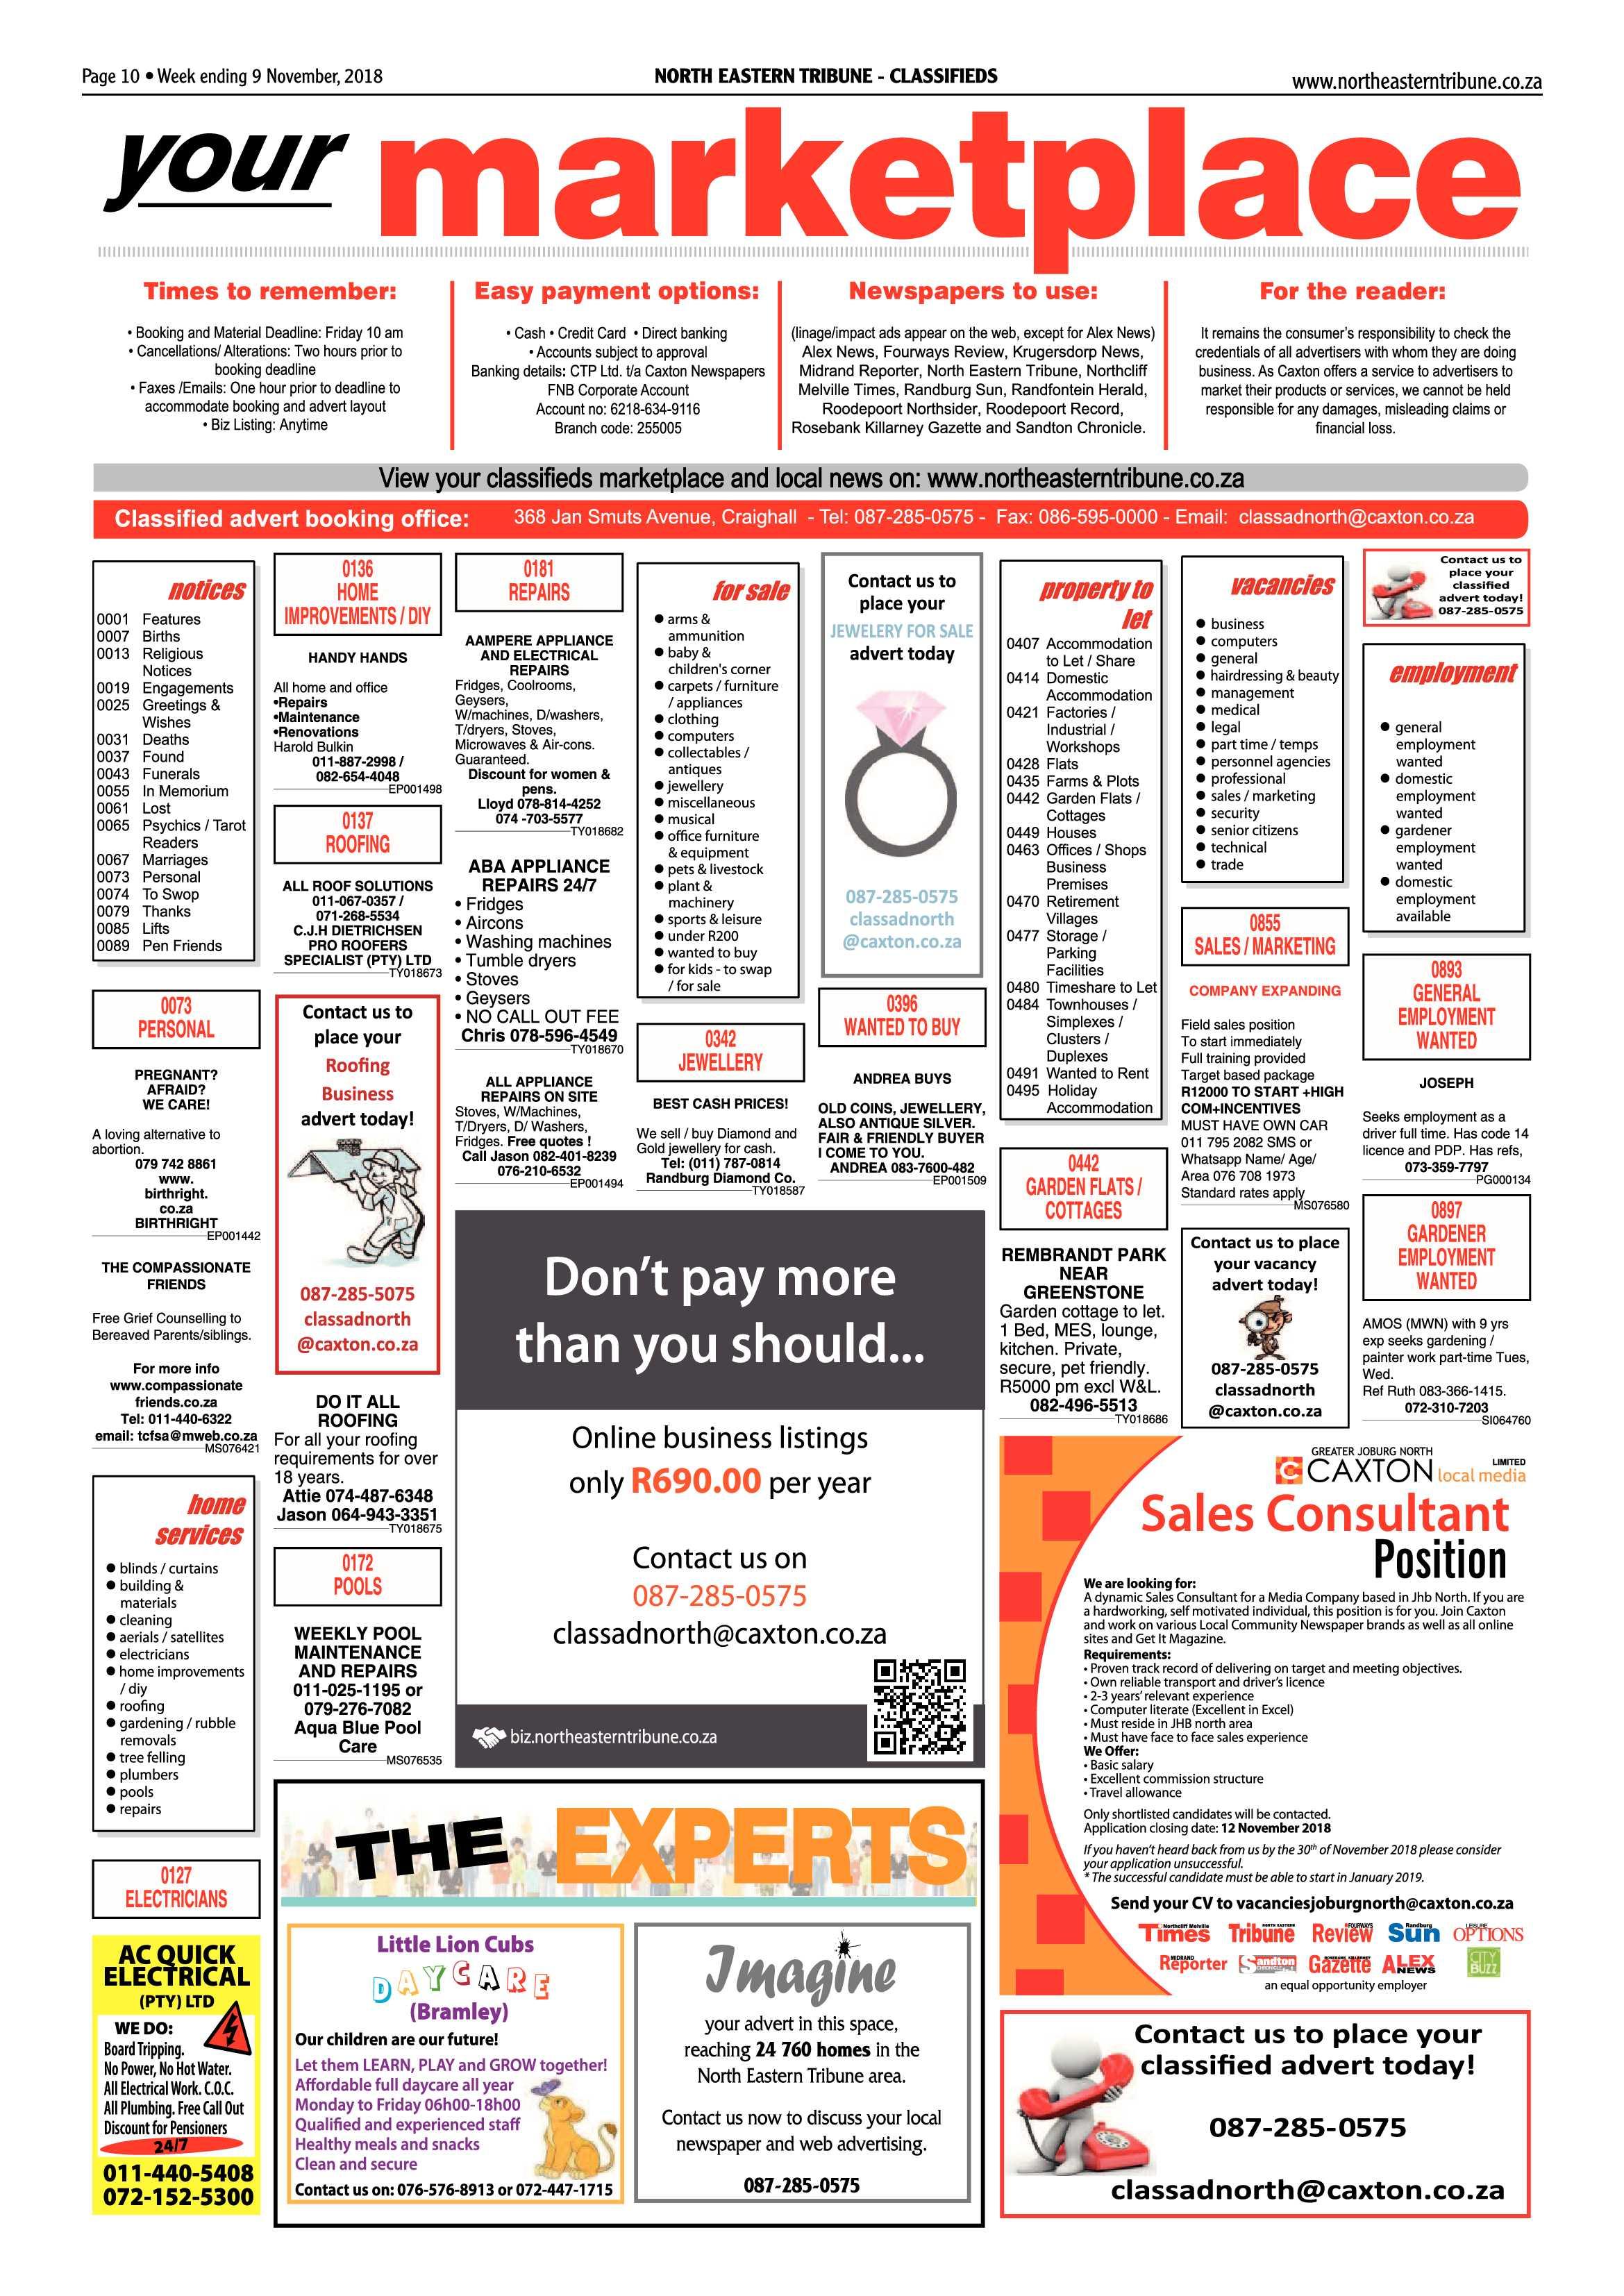 north-eastern-tribune-9-november-2018-epapers-page-10